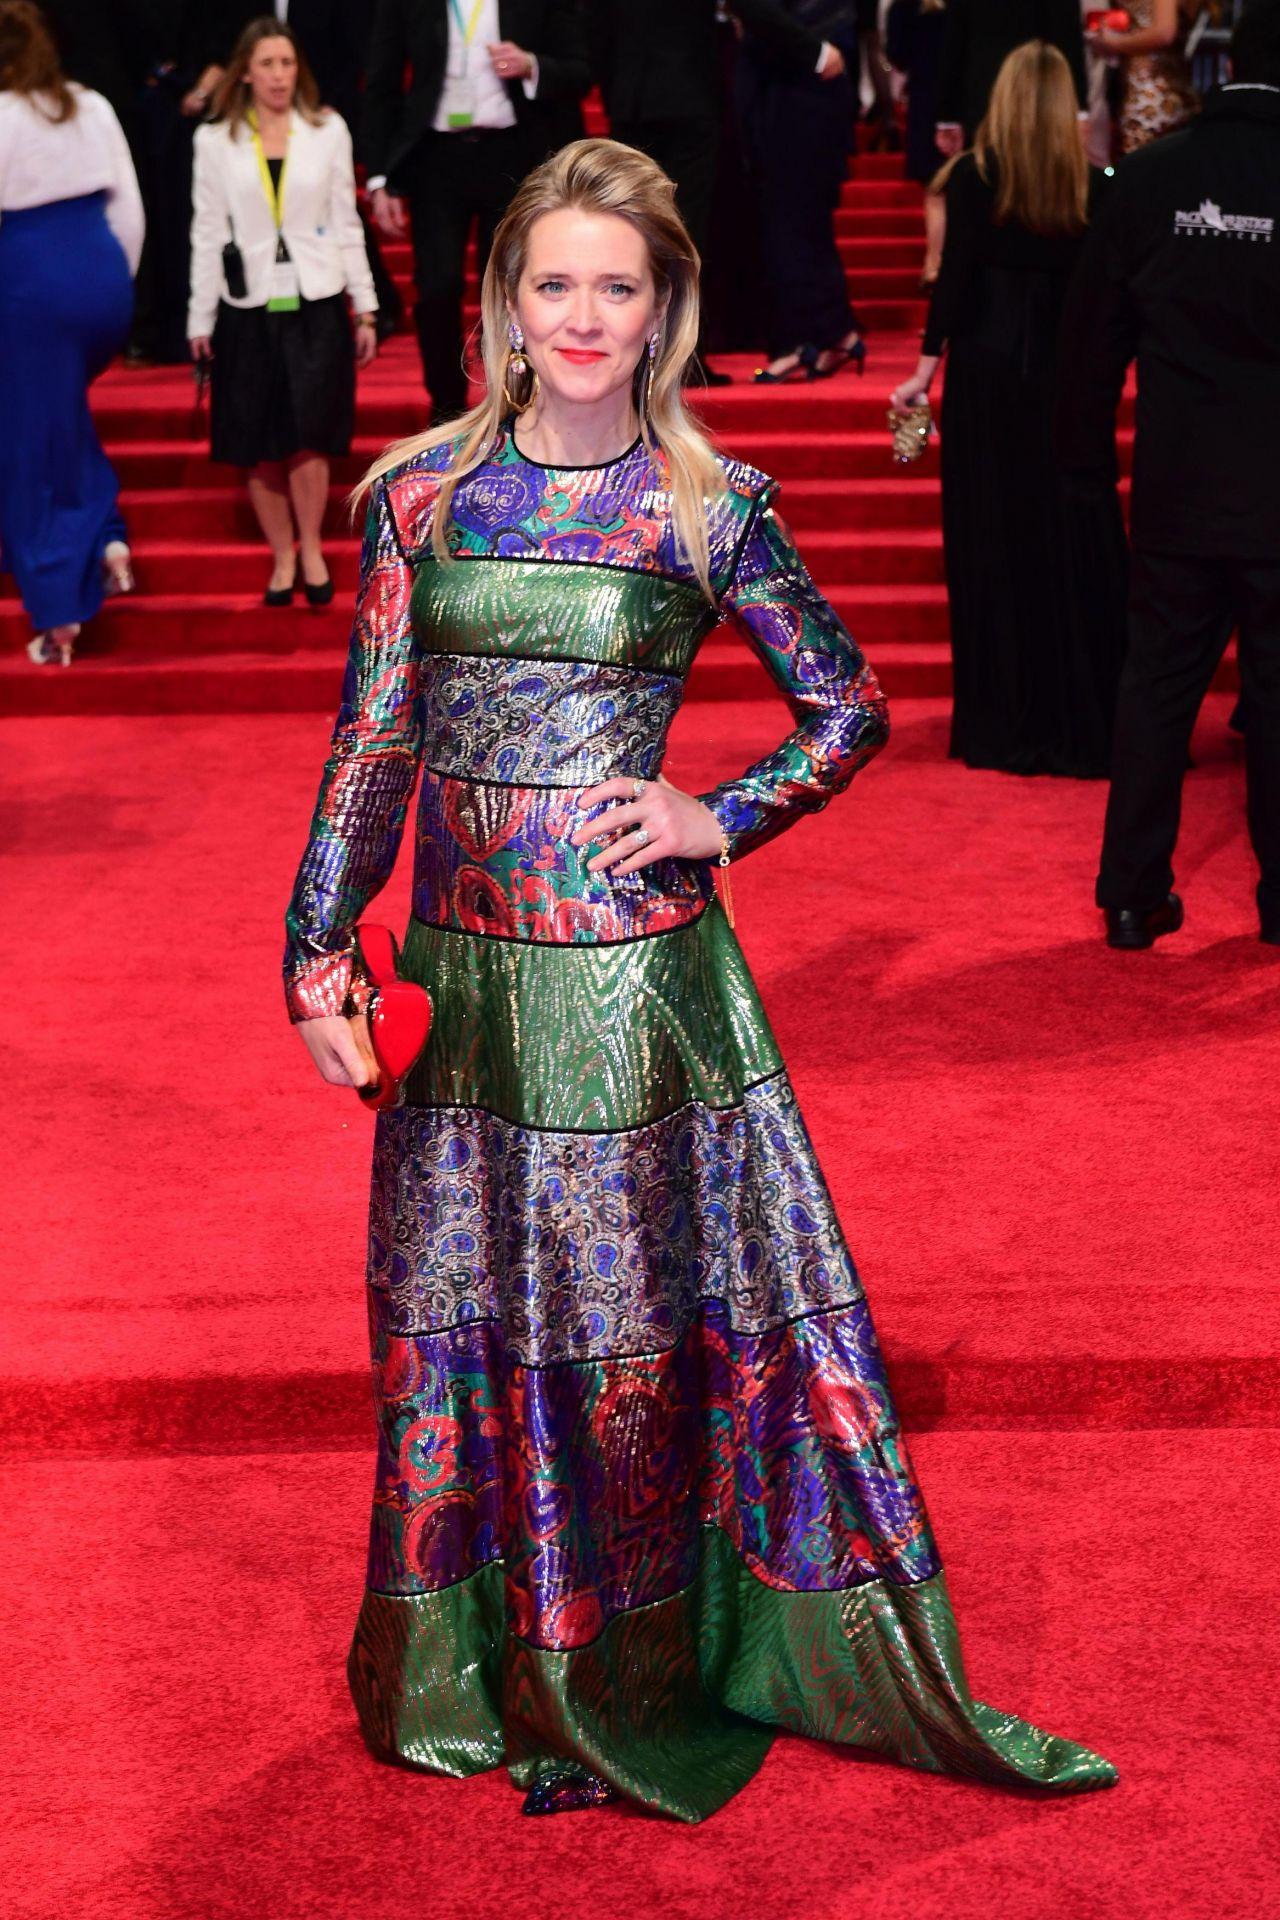 Edith Bowman at BAFTA Awards in London, UK 2/12/ 2017